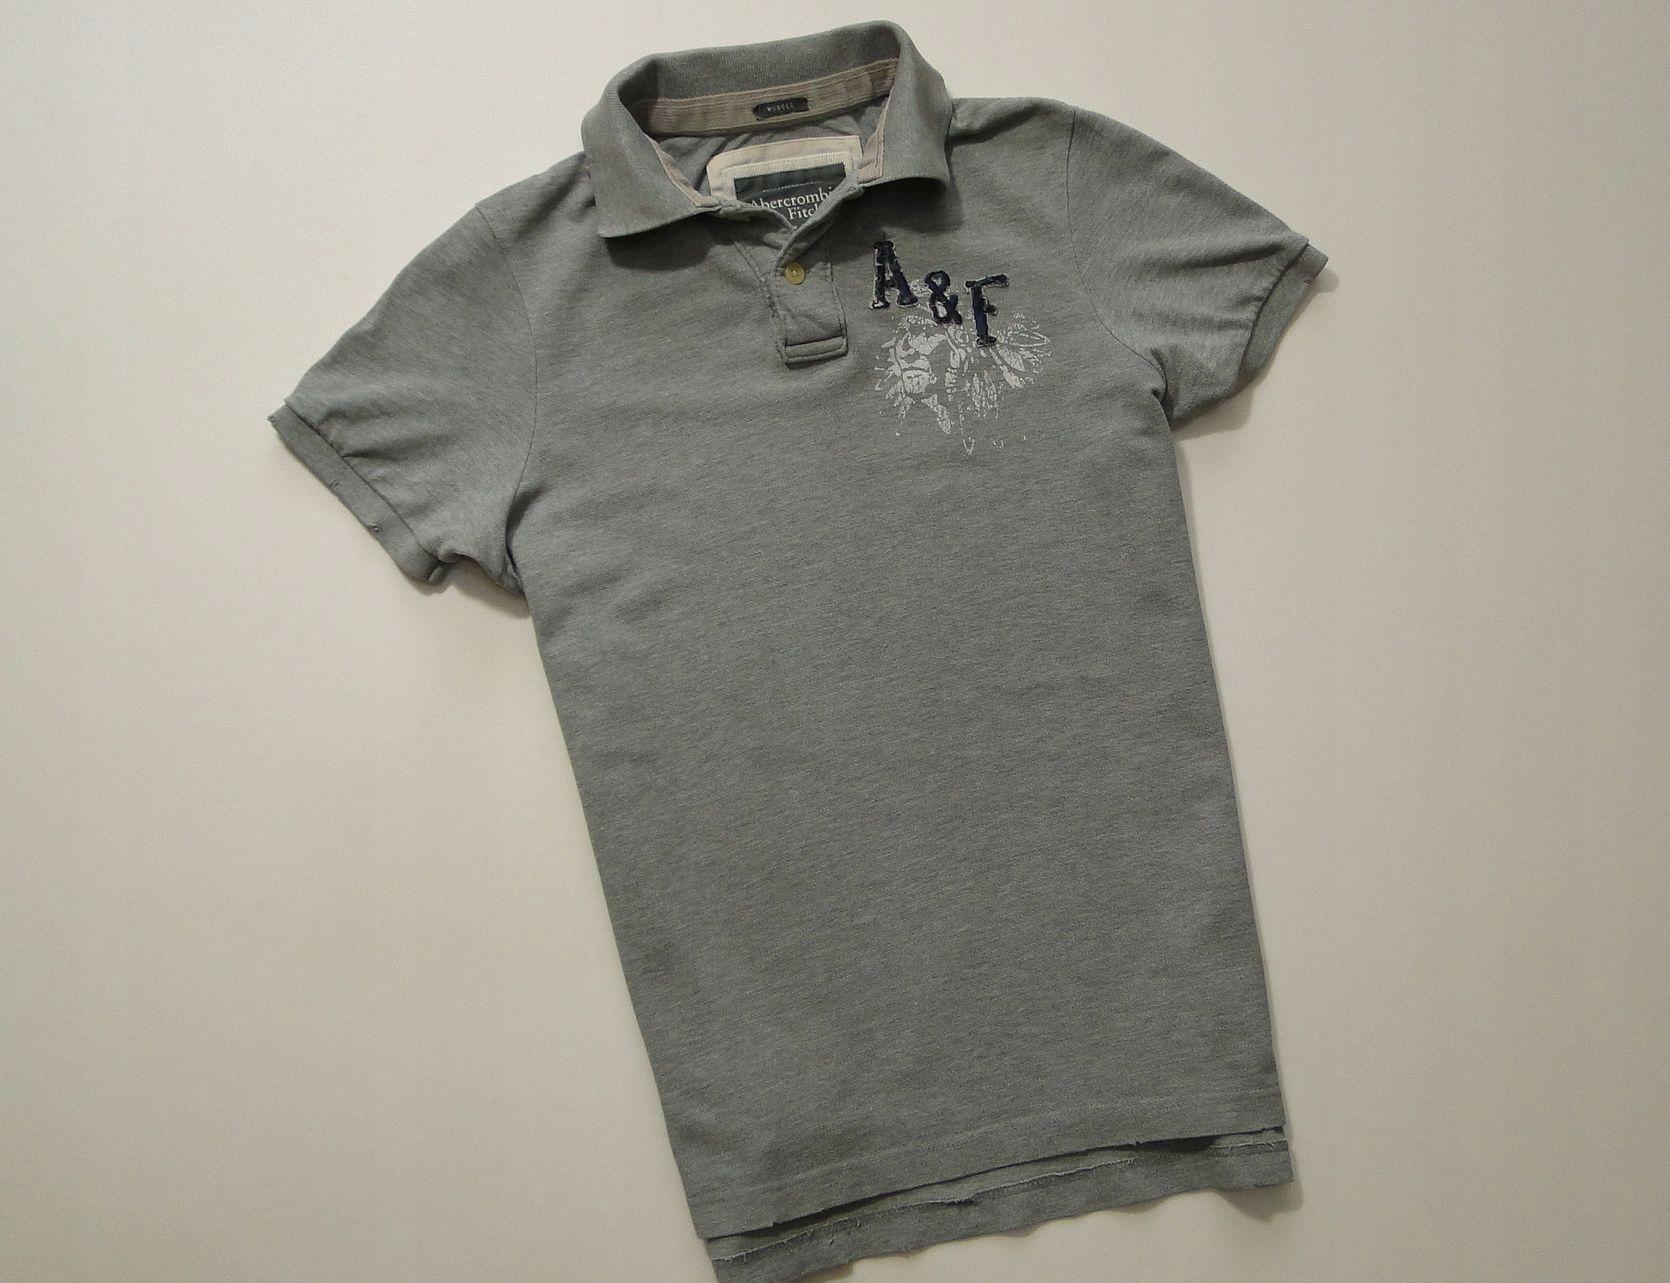 Koszulka Abercrombie Fitch Muscle New York Polo S